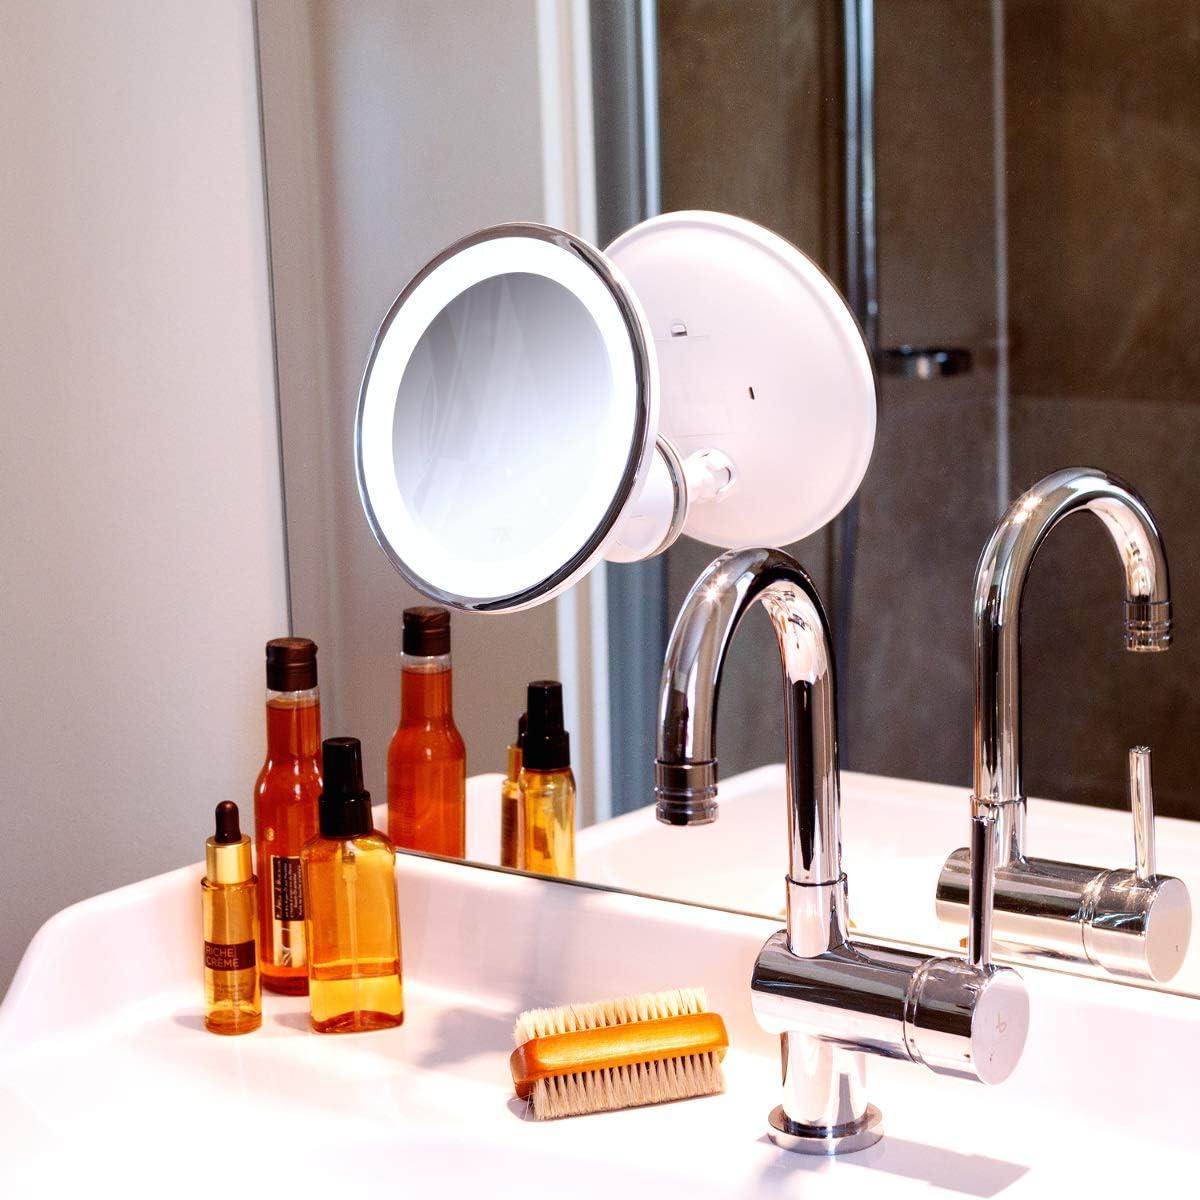 Navaris Espejo de Aumento x5 con luz Espejo de Maquillaje y depilaci/ón Espejo con Ventosa e iluminaci/ón LED Giratorio y Ajustable 360/°